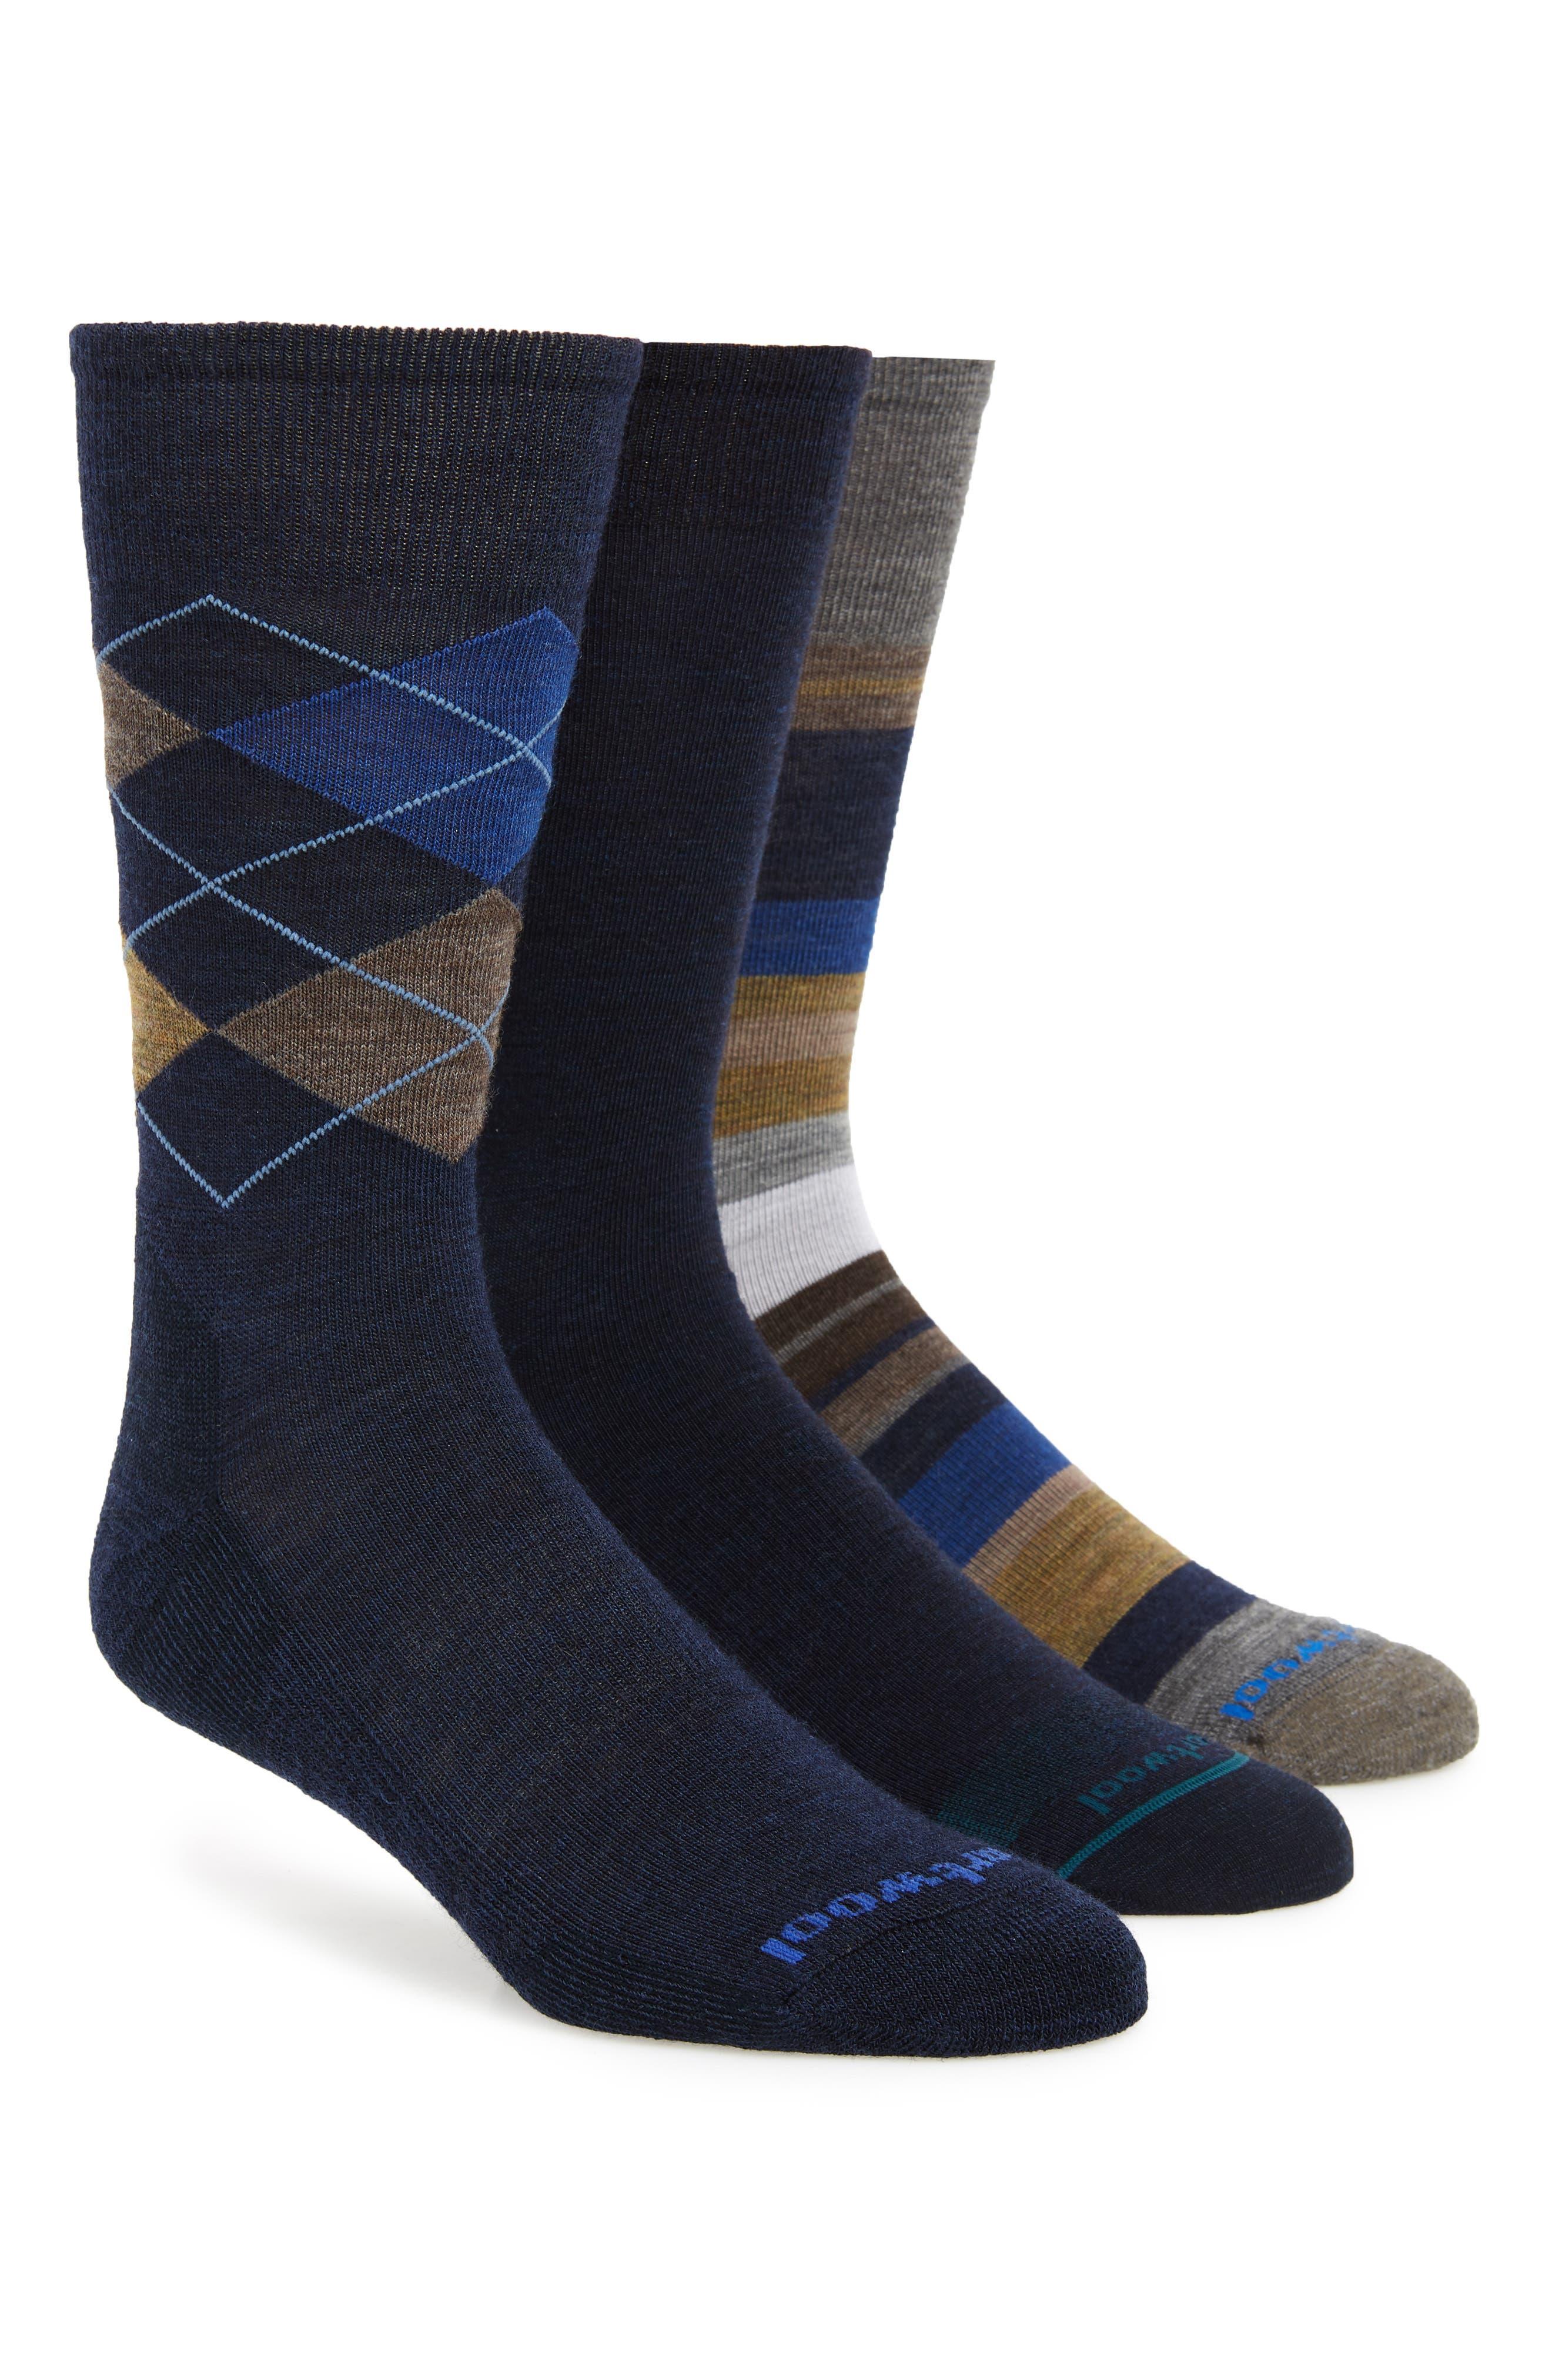 3-Pack Socks,                         Main,                         color, 400